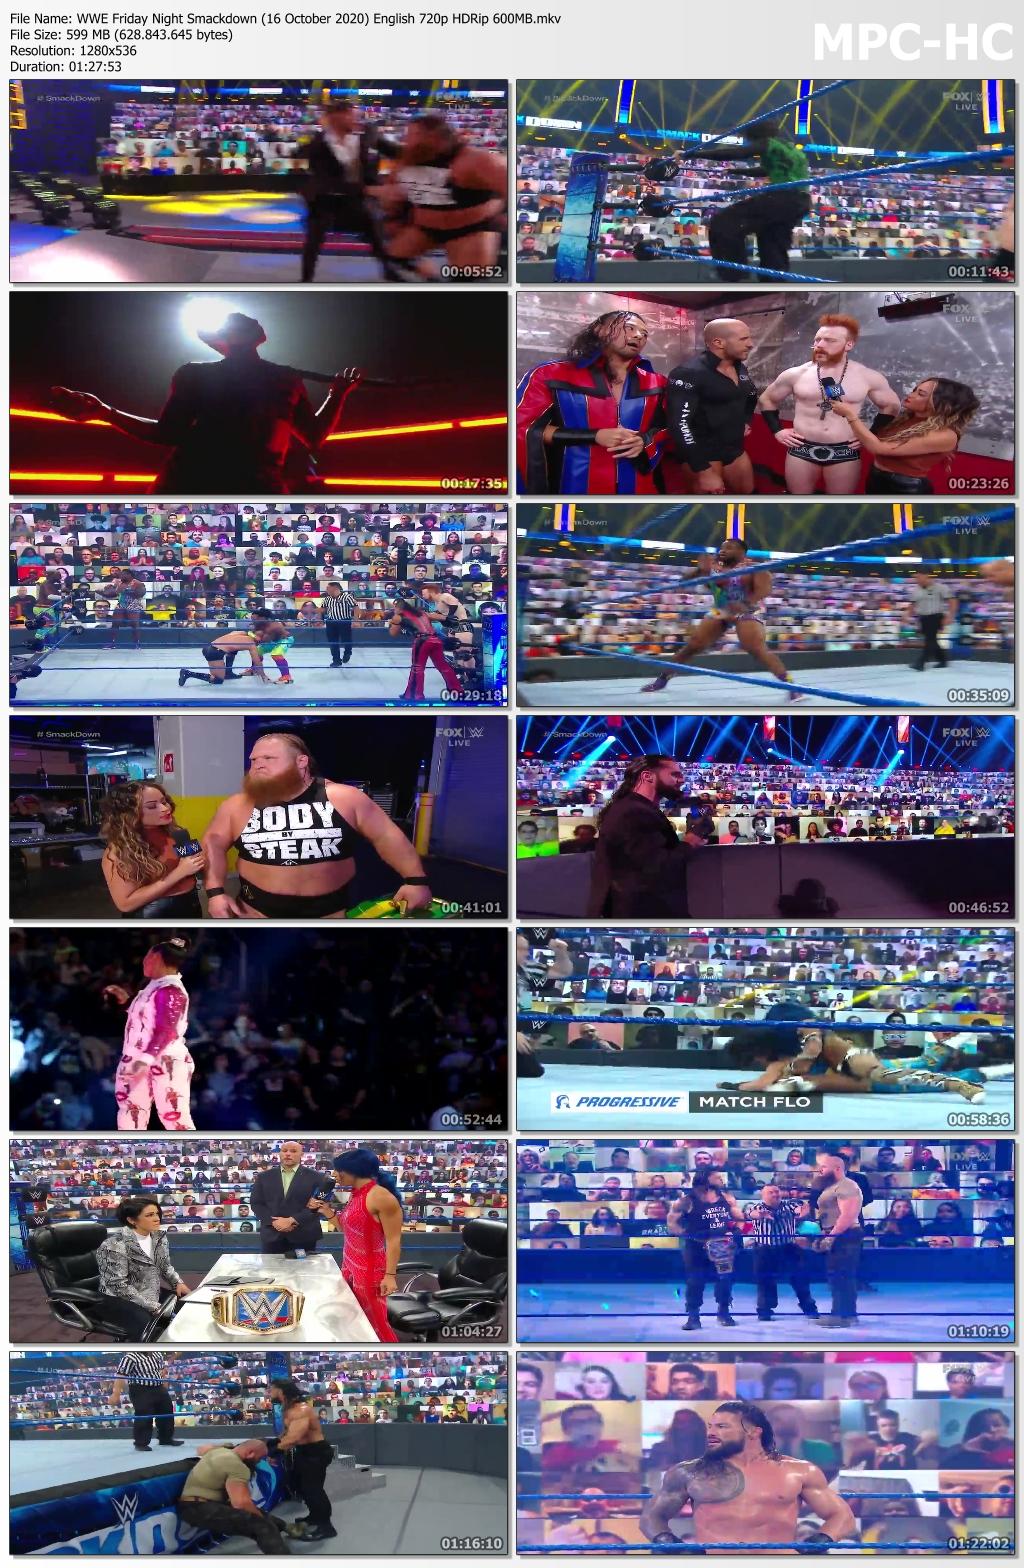 WWE-Friday-Night-Smackdown-16-October-2020-English-720p-HDRip-600-MB-mkv-thumbs